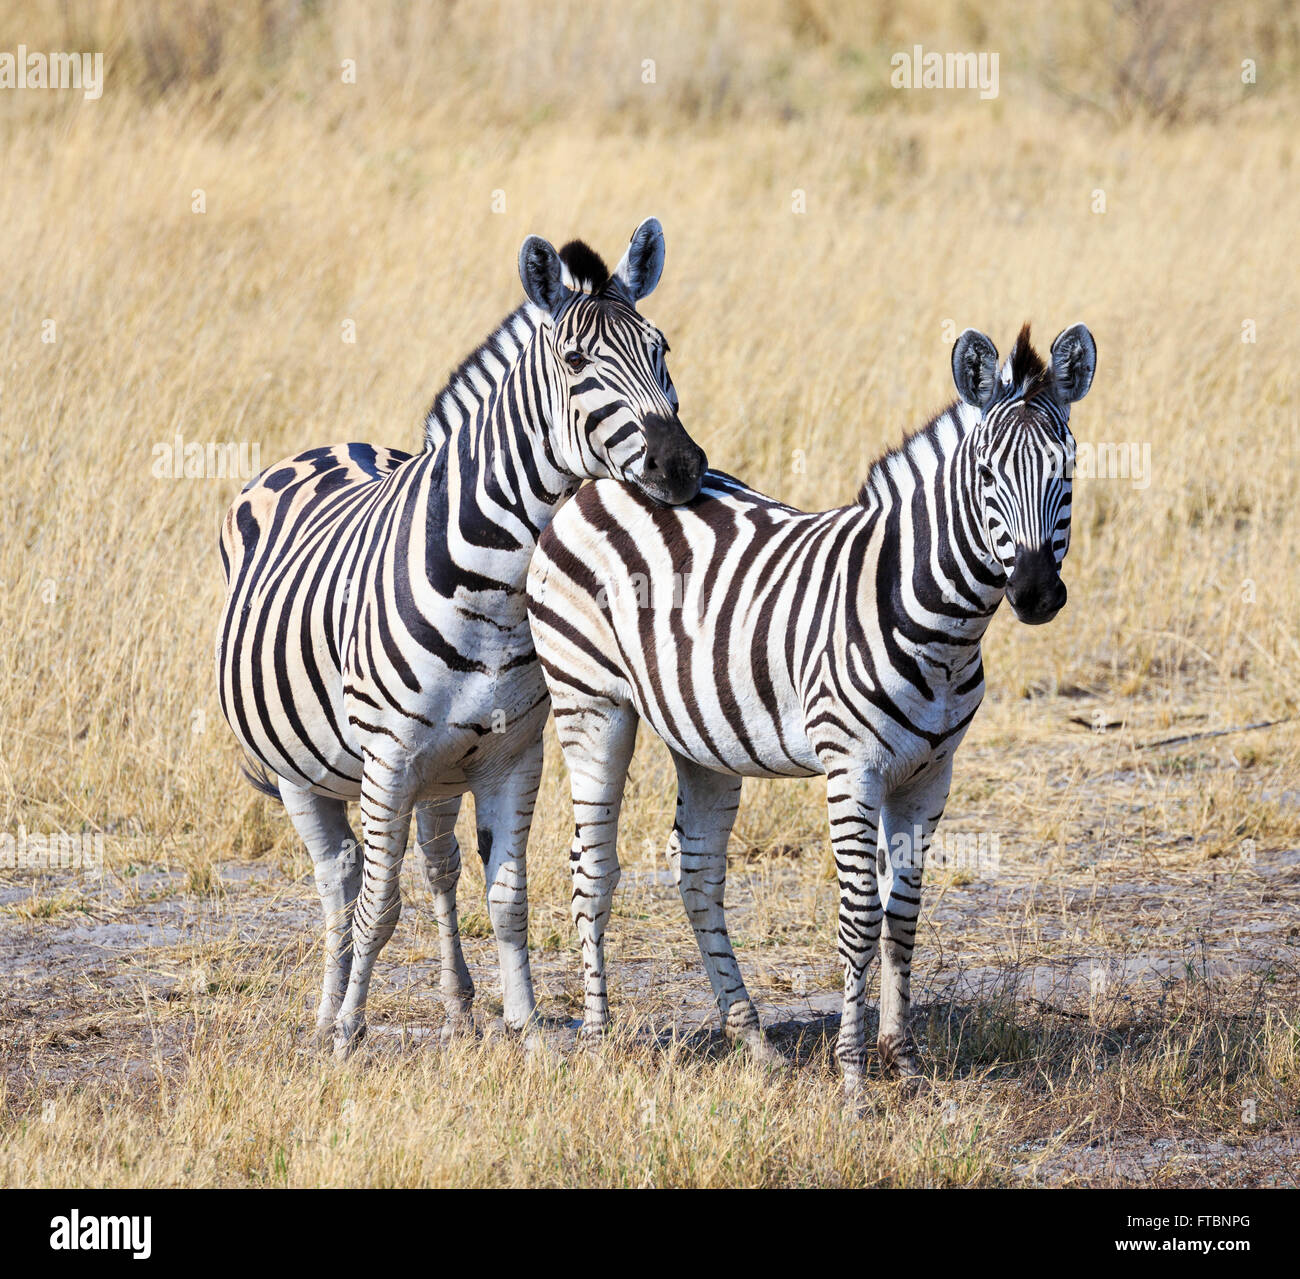 Two plains or Burchell's zebra (Equus quagga), Sandibe Camp, by the Moremi Game Reserve, Okavango Delta, Botswana, - Stock Image